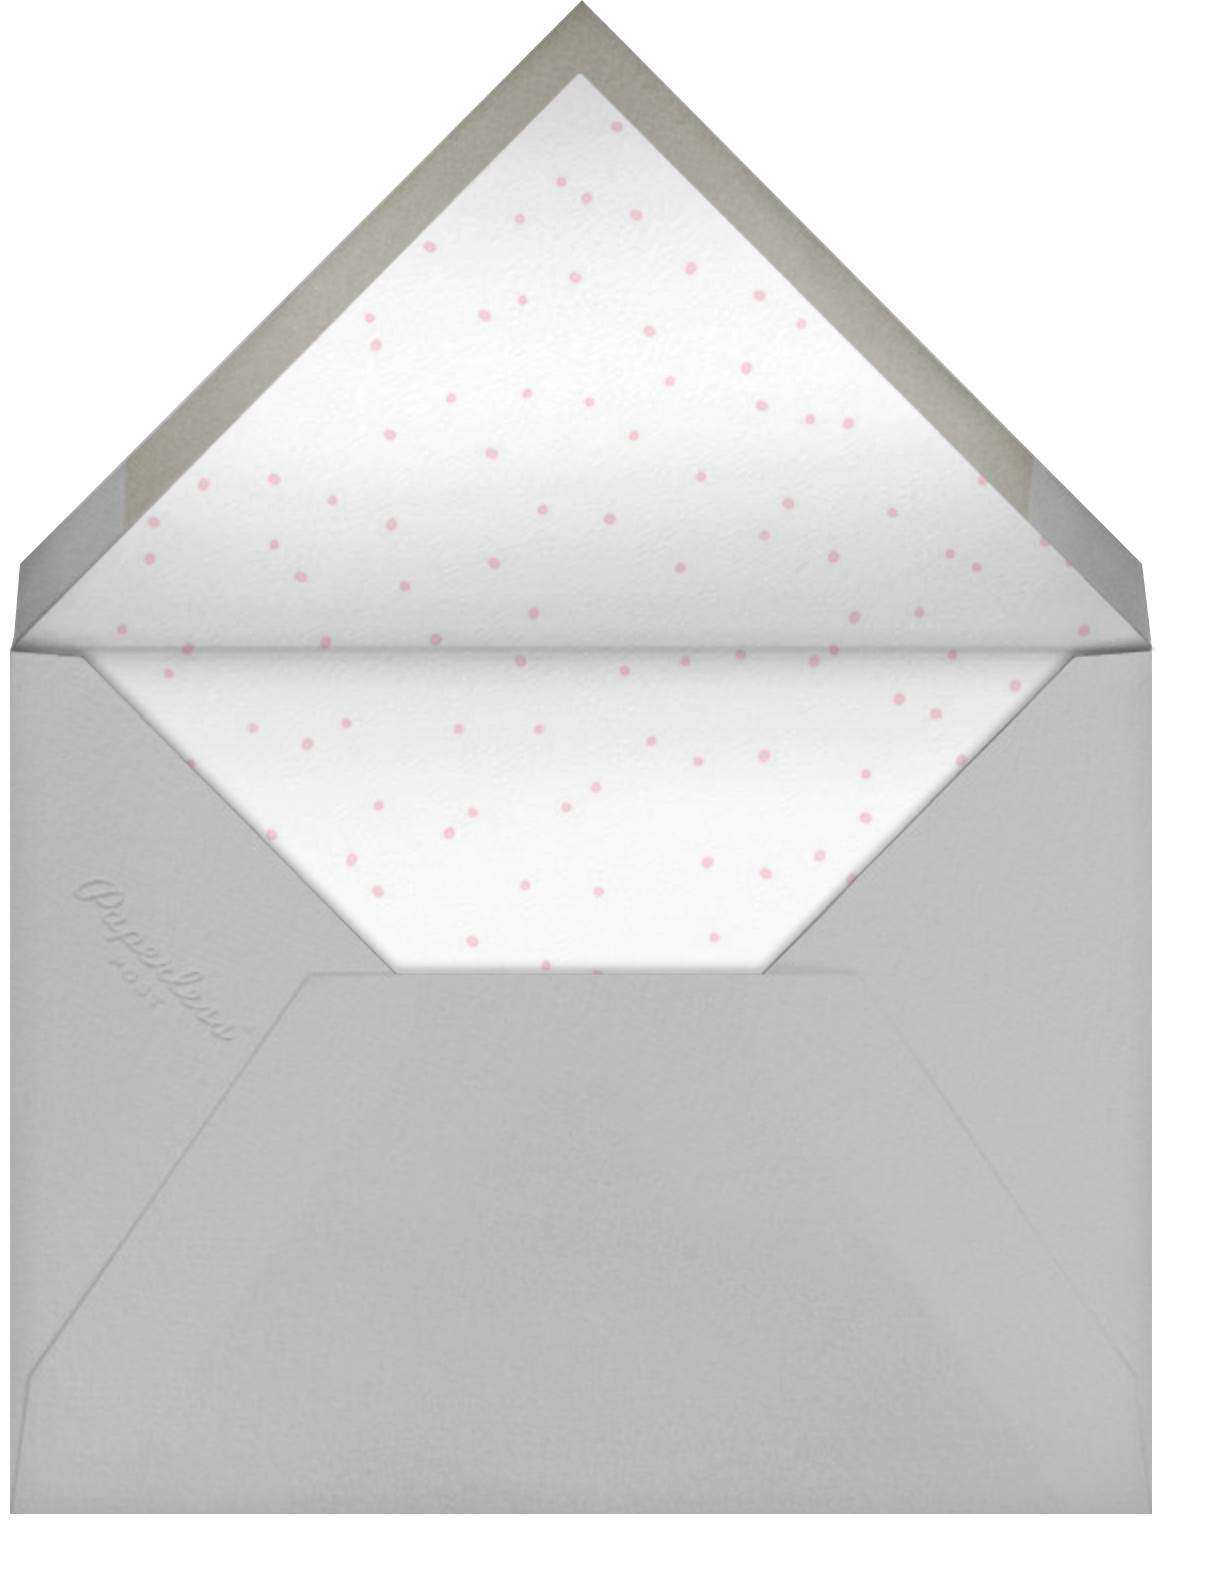 Baby Bunny Photo - Little Cube - Birth - envelope back